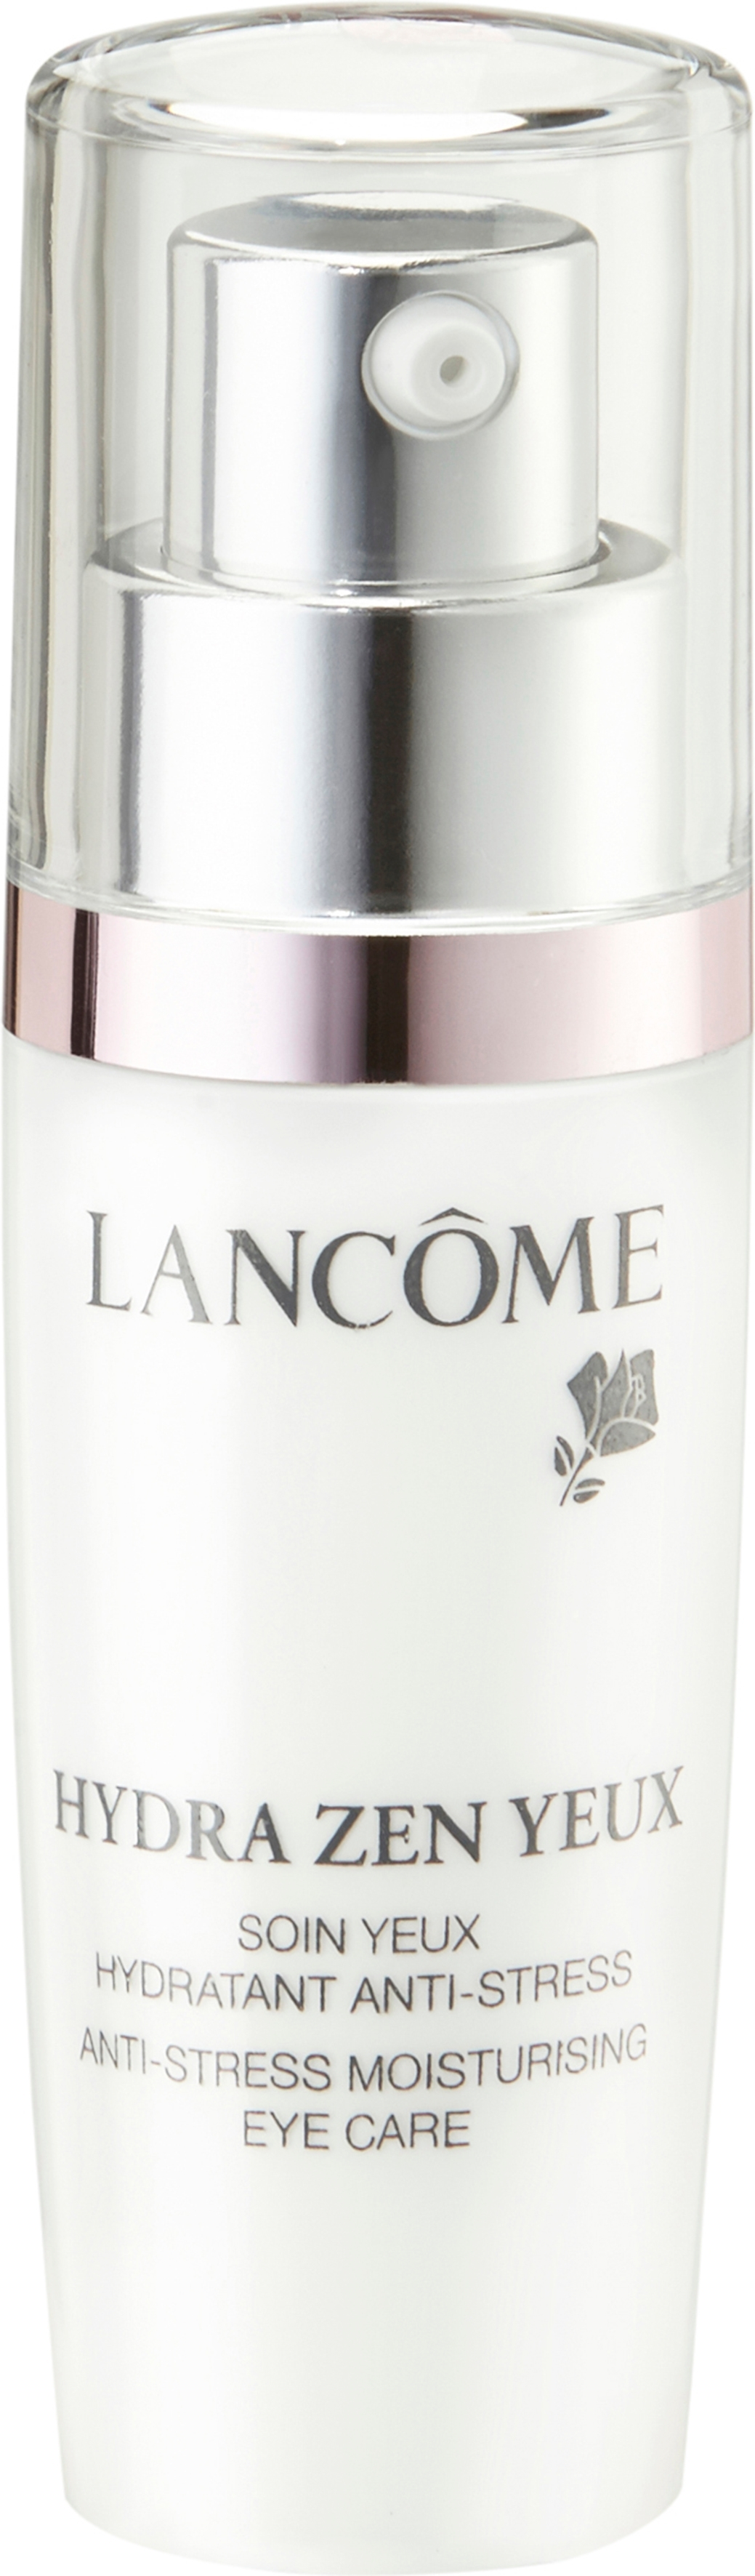 LANCOME »Hydra Zen Neurocalm Crème Yeux« ooggel bij OTTO online kopen